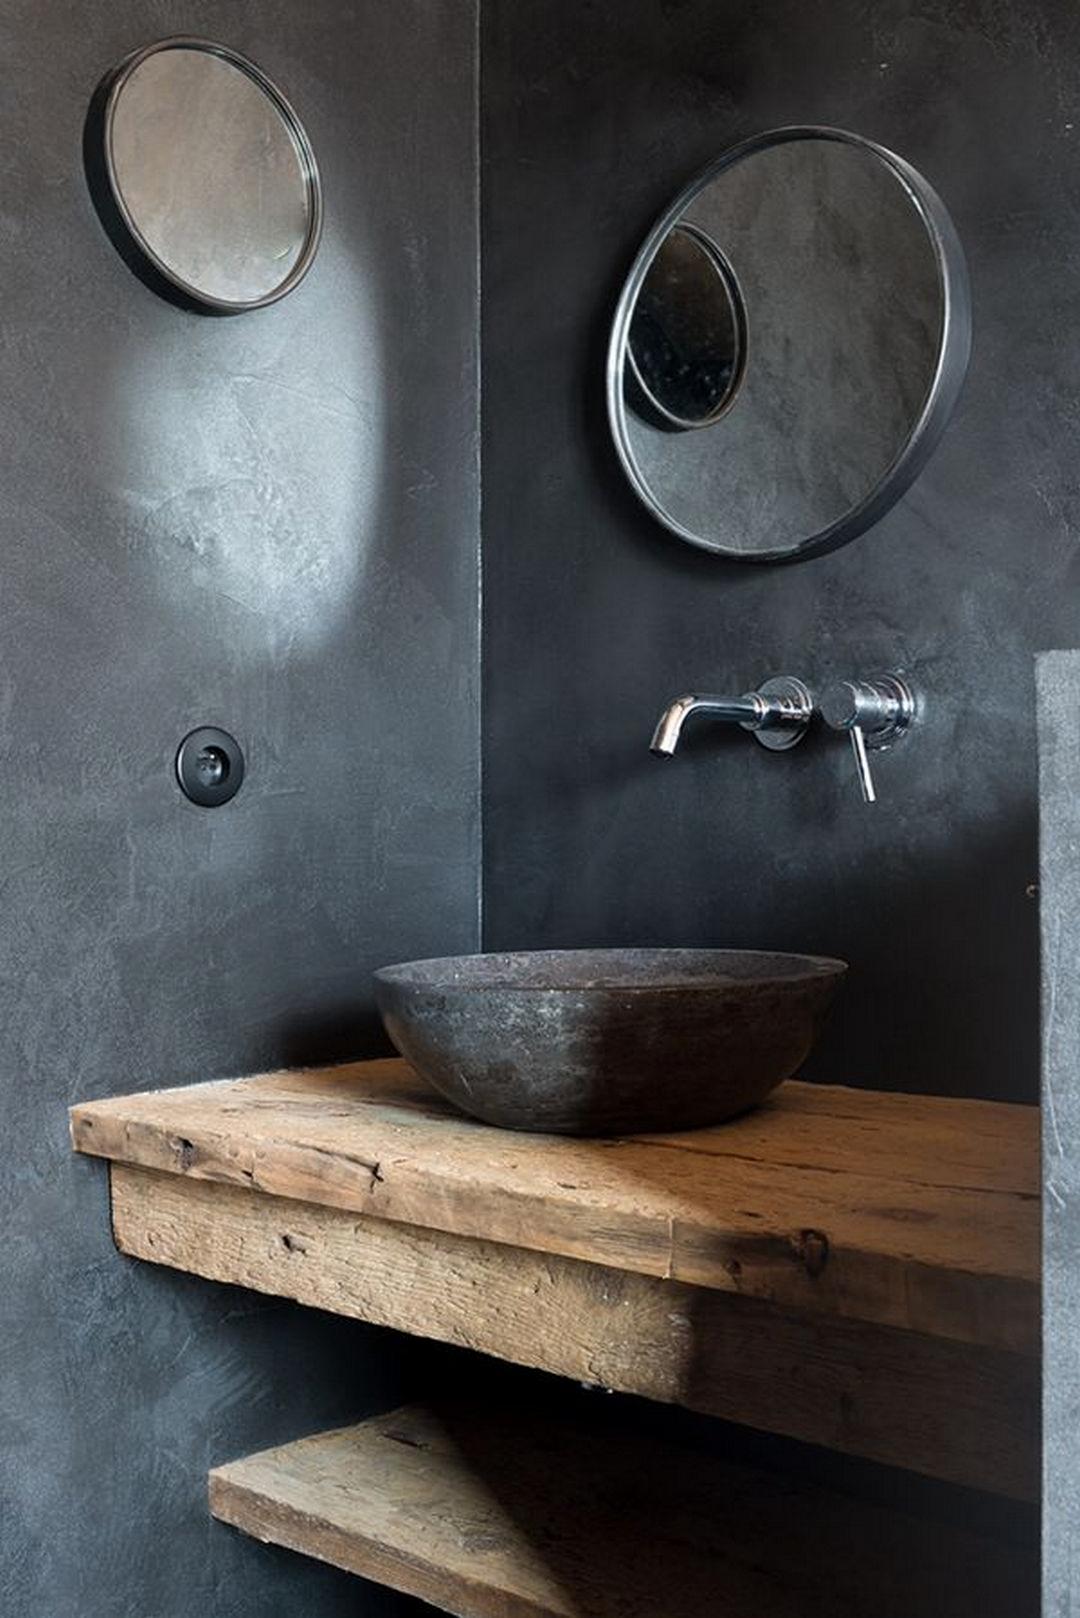 houten werkblad badkamer granieten wastafel